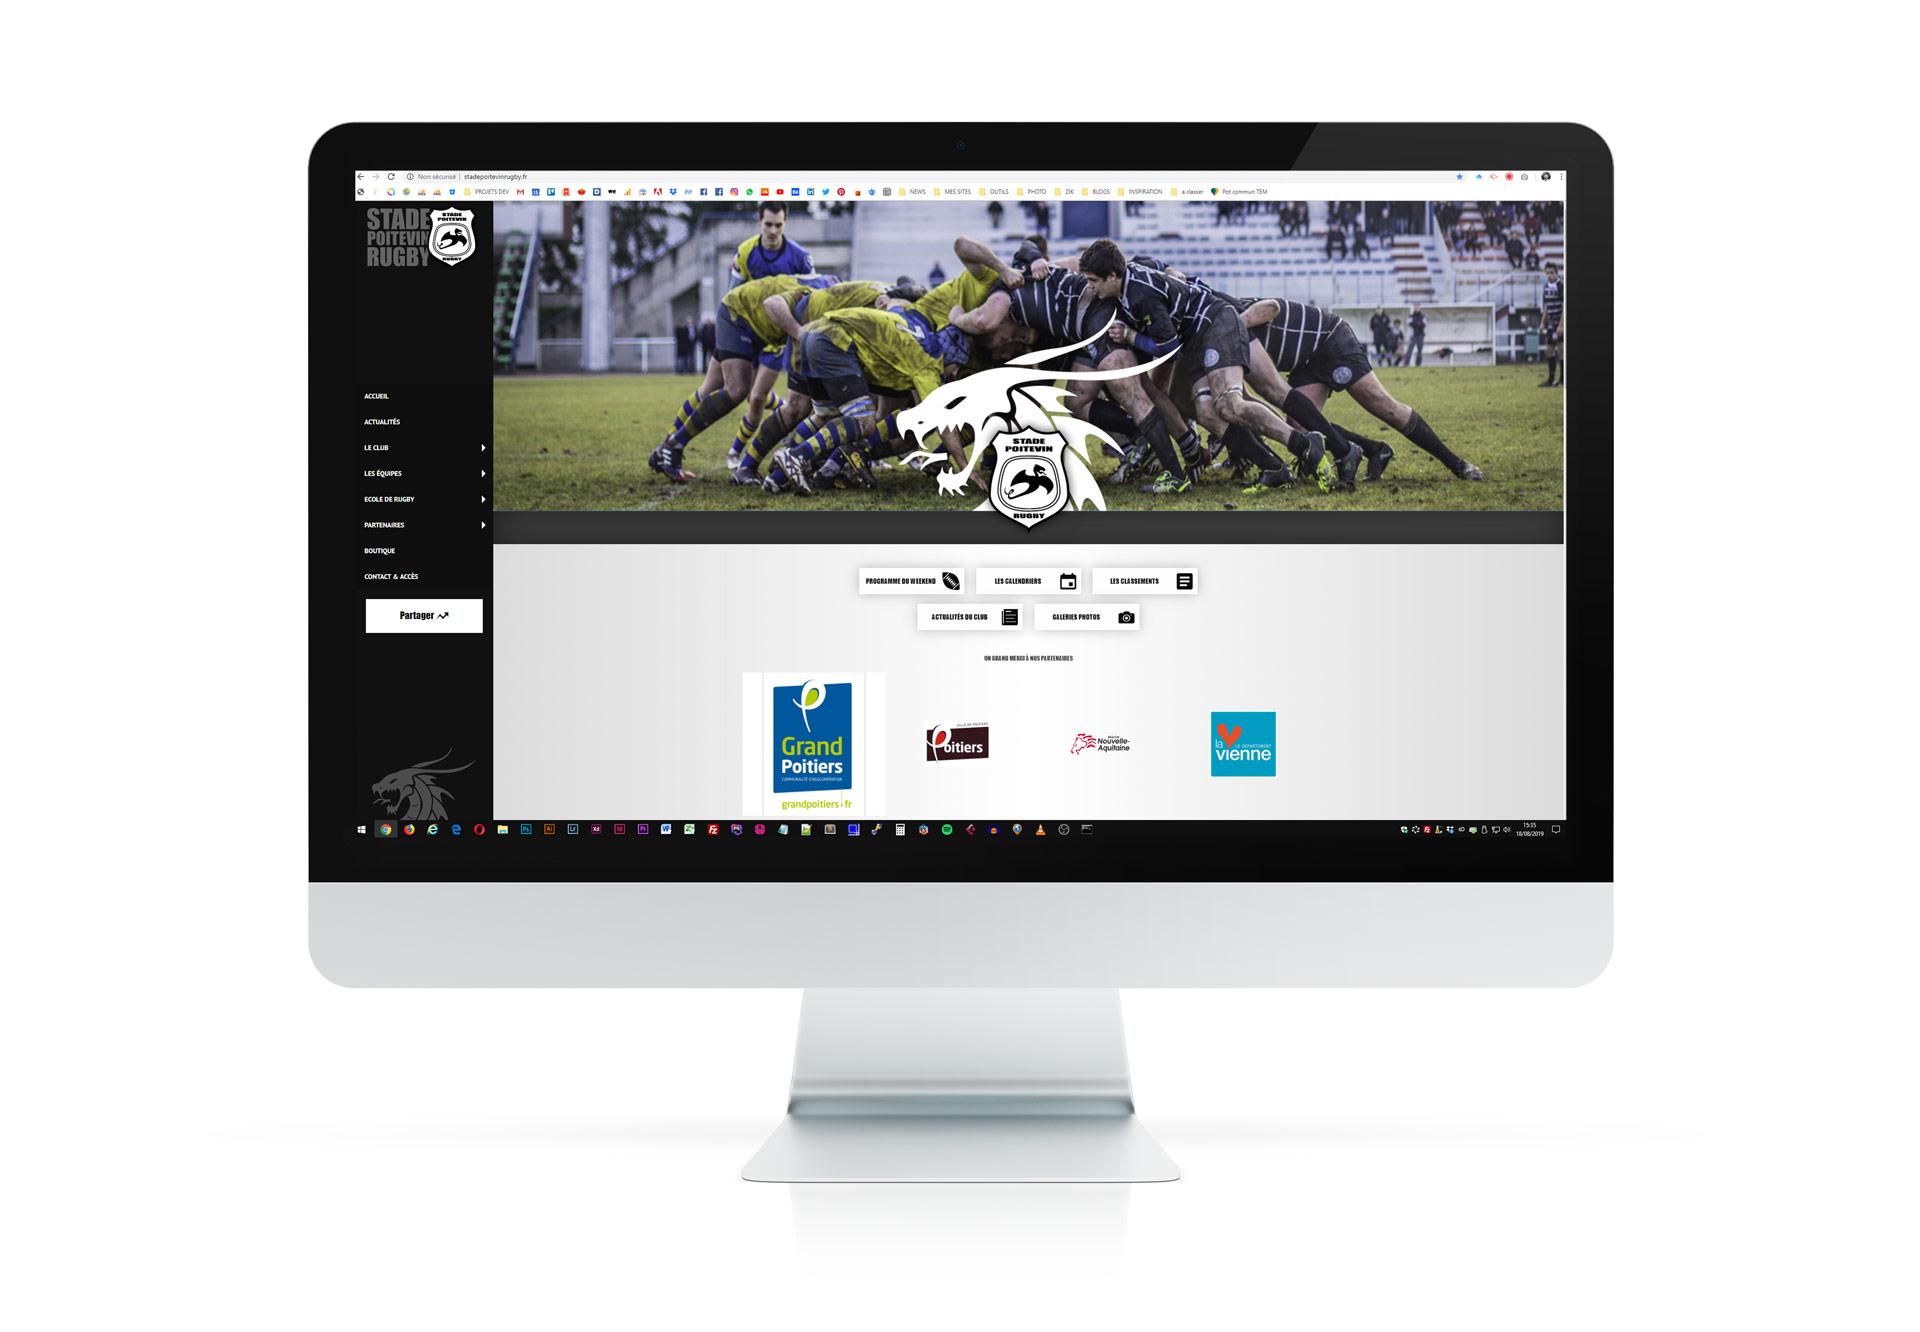 visuel sur ecran du site internet du stade poitevin rugby